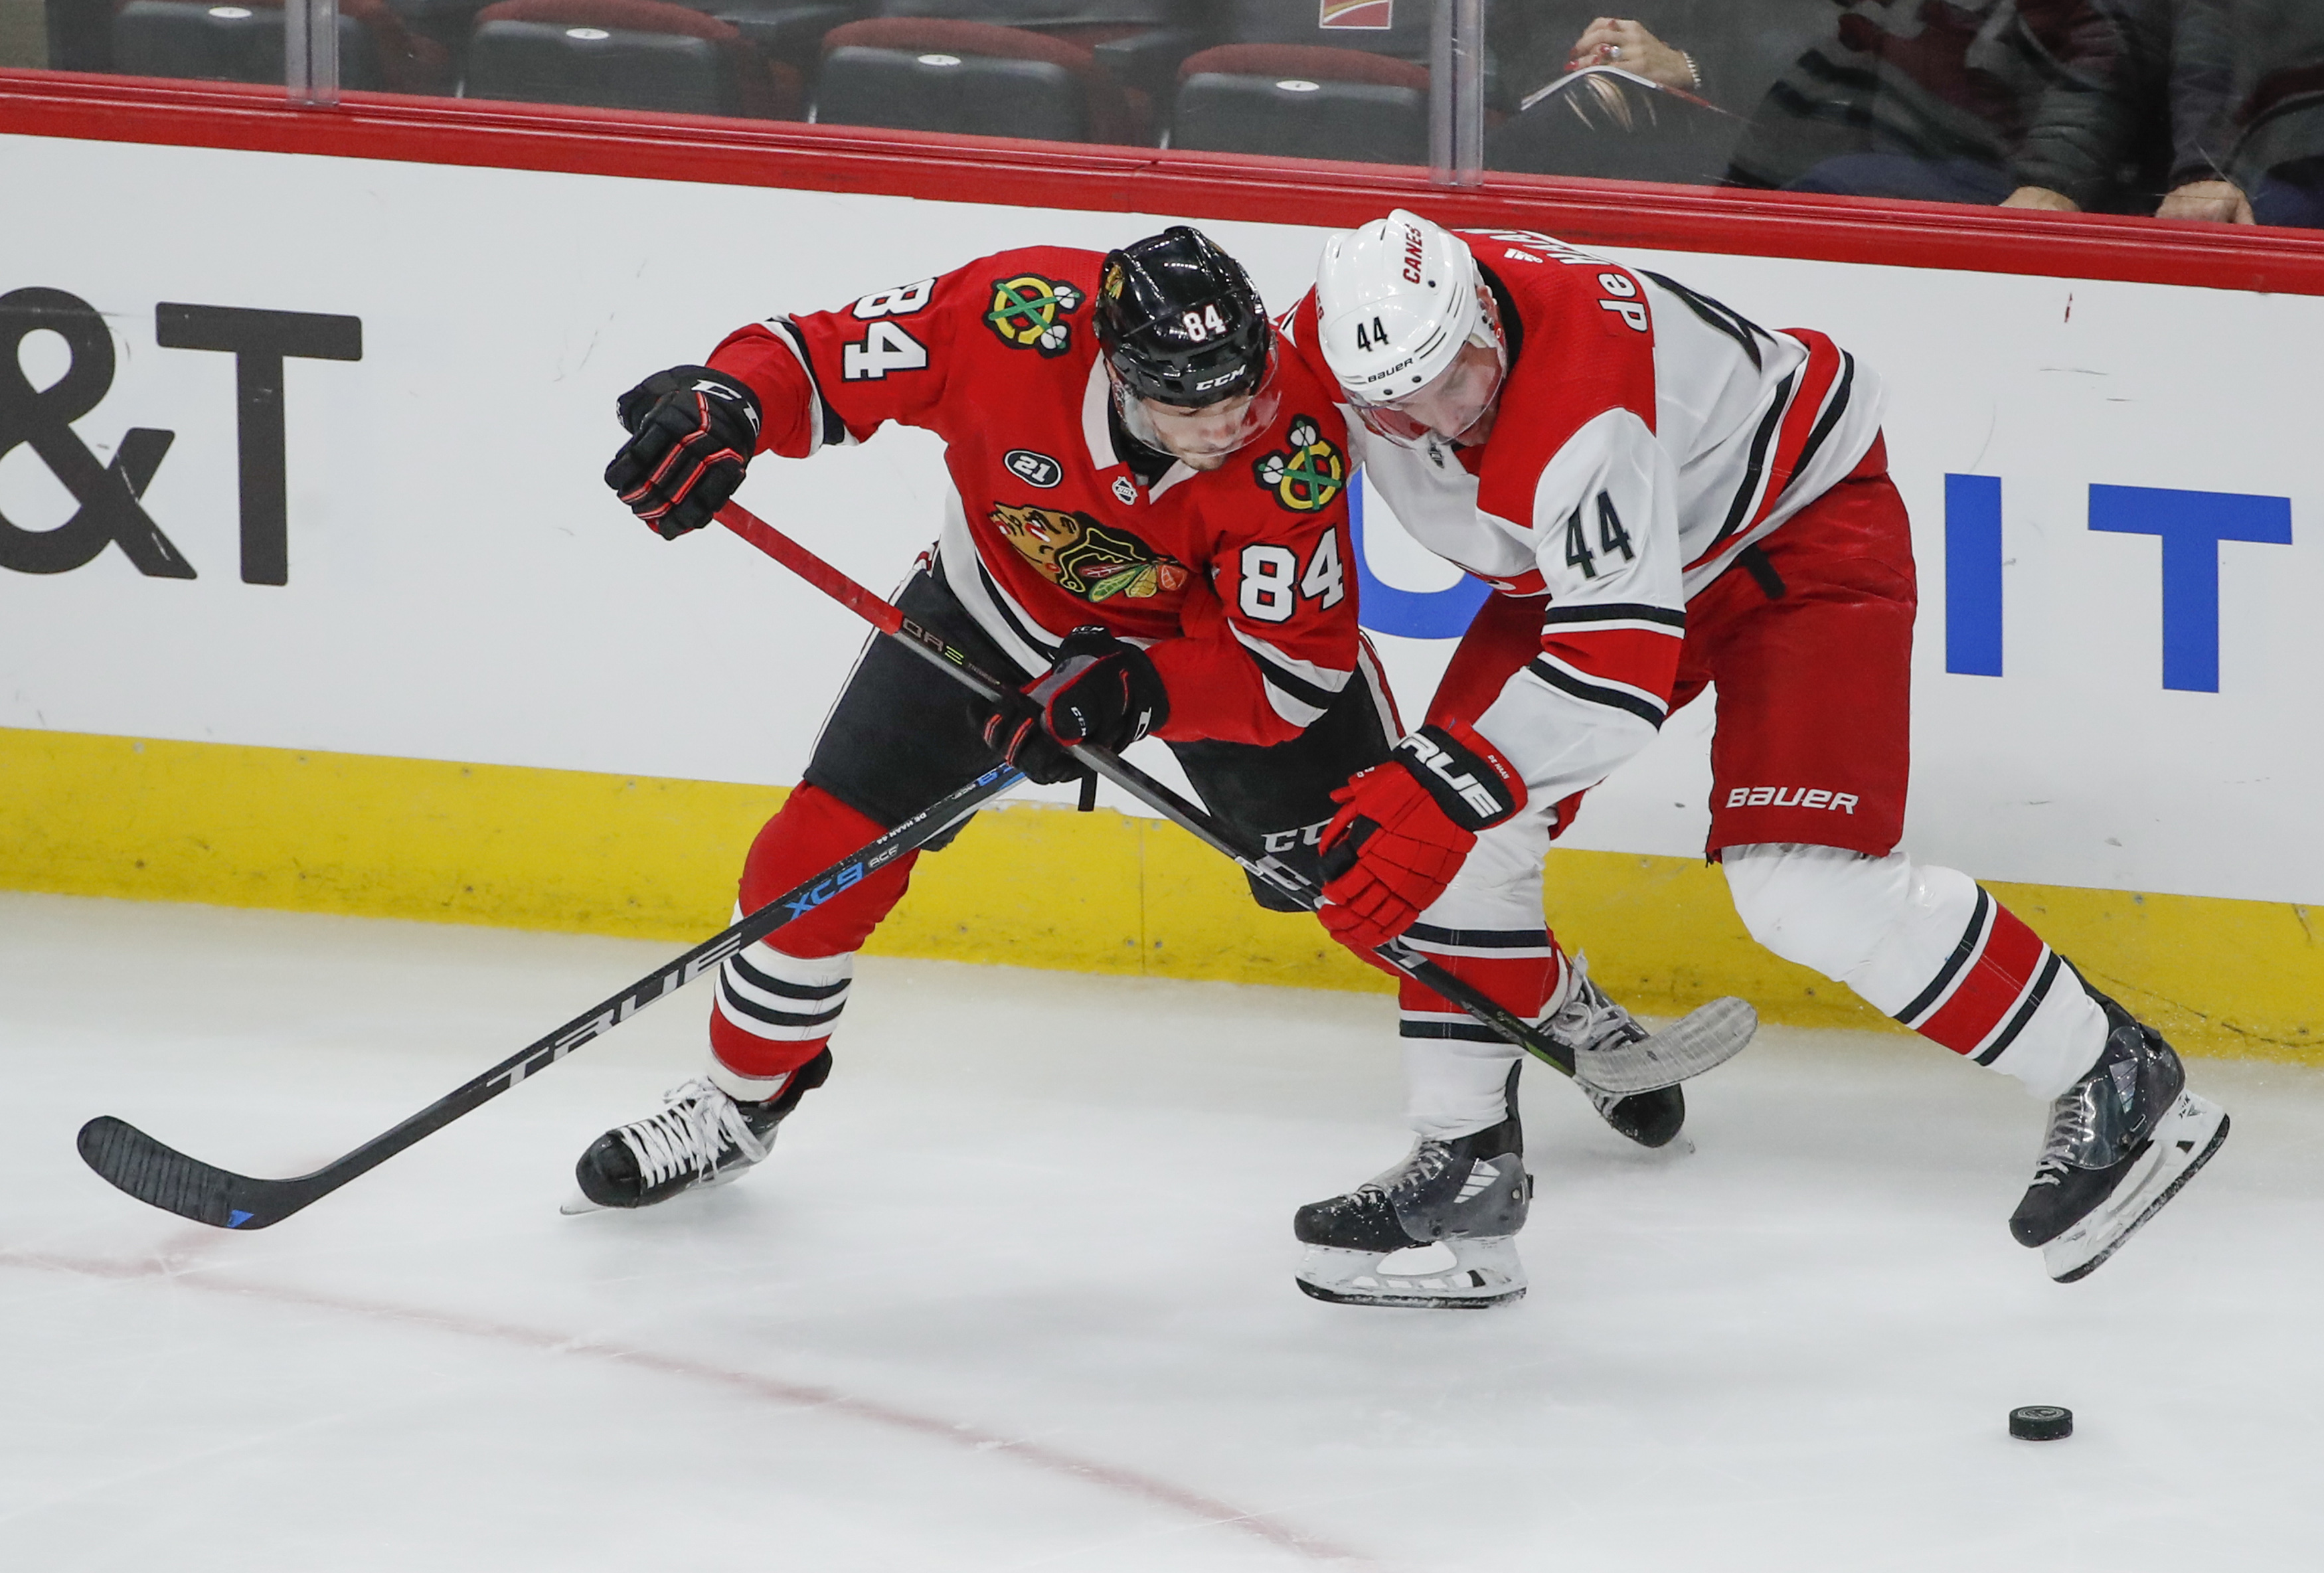 NHL: Carolina Hurricanes at Chicago Blackhawks